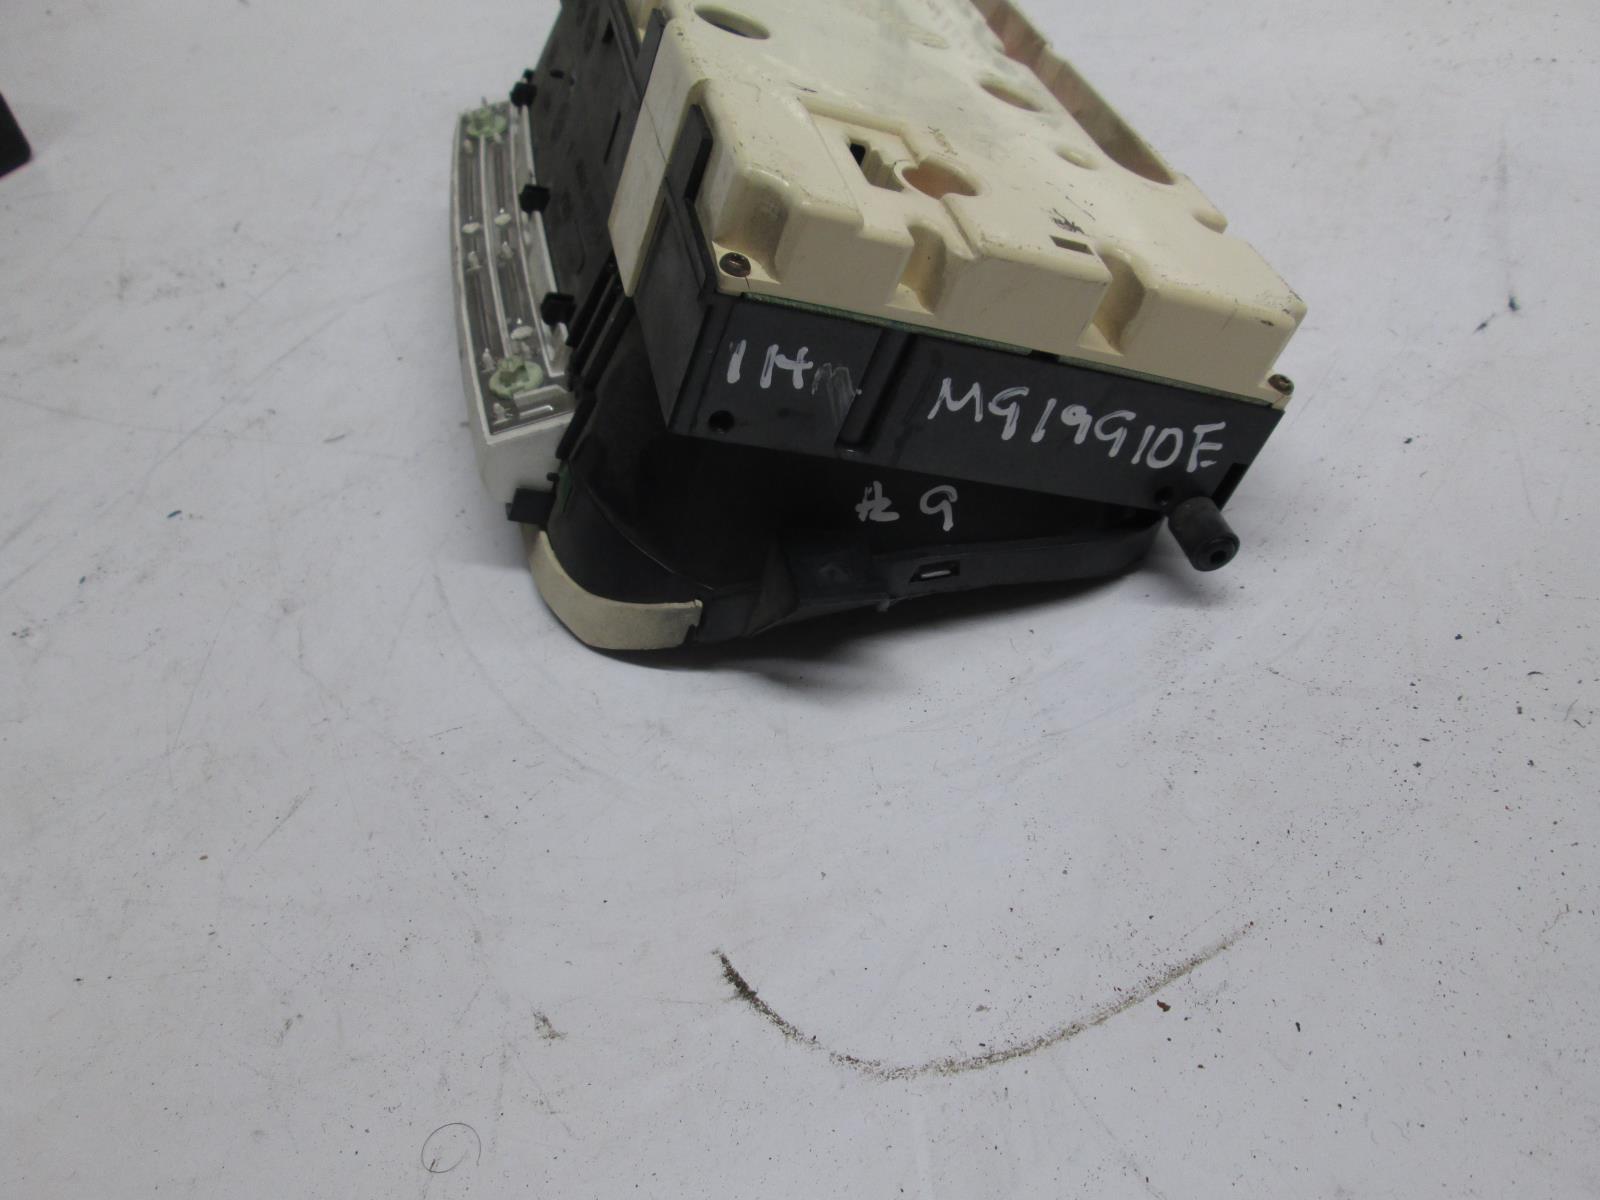 volkswagen mk3 jetta golf cabrio instrument cluster. Black Bedroom Furniture Sets. Home Design Ideas